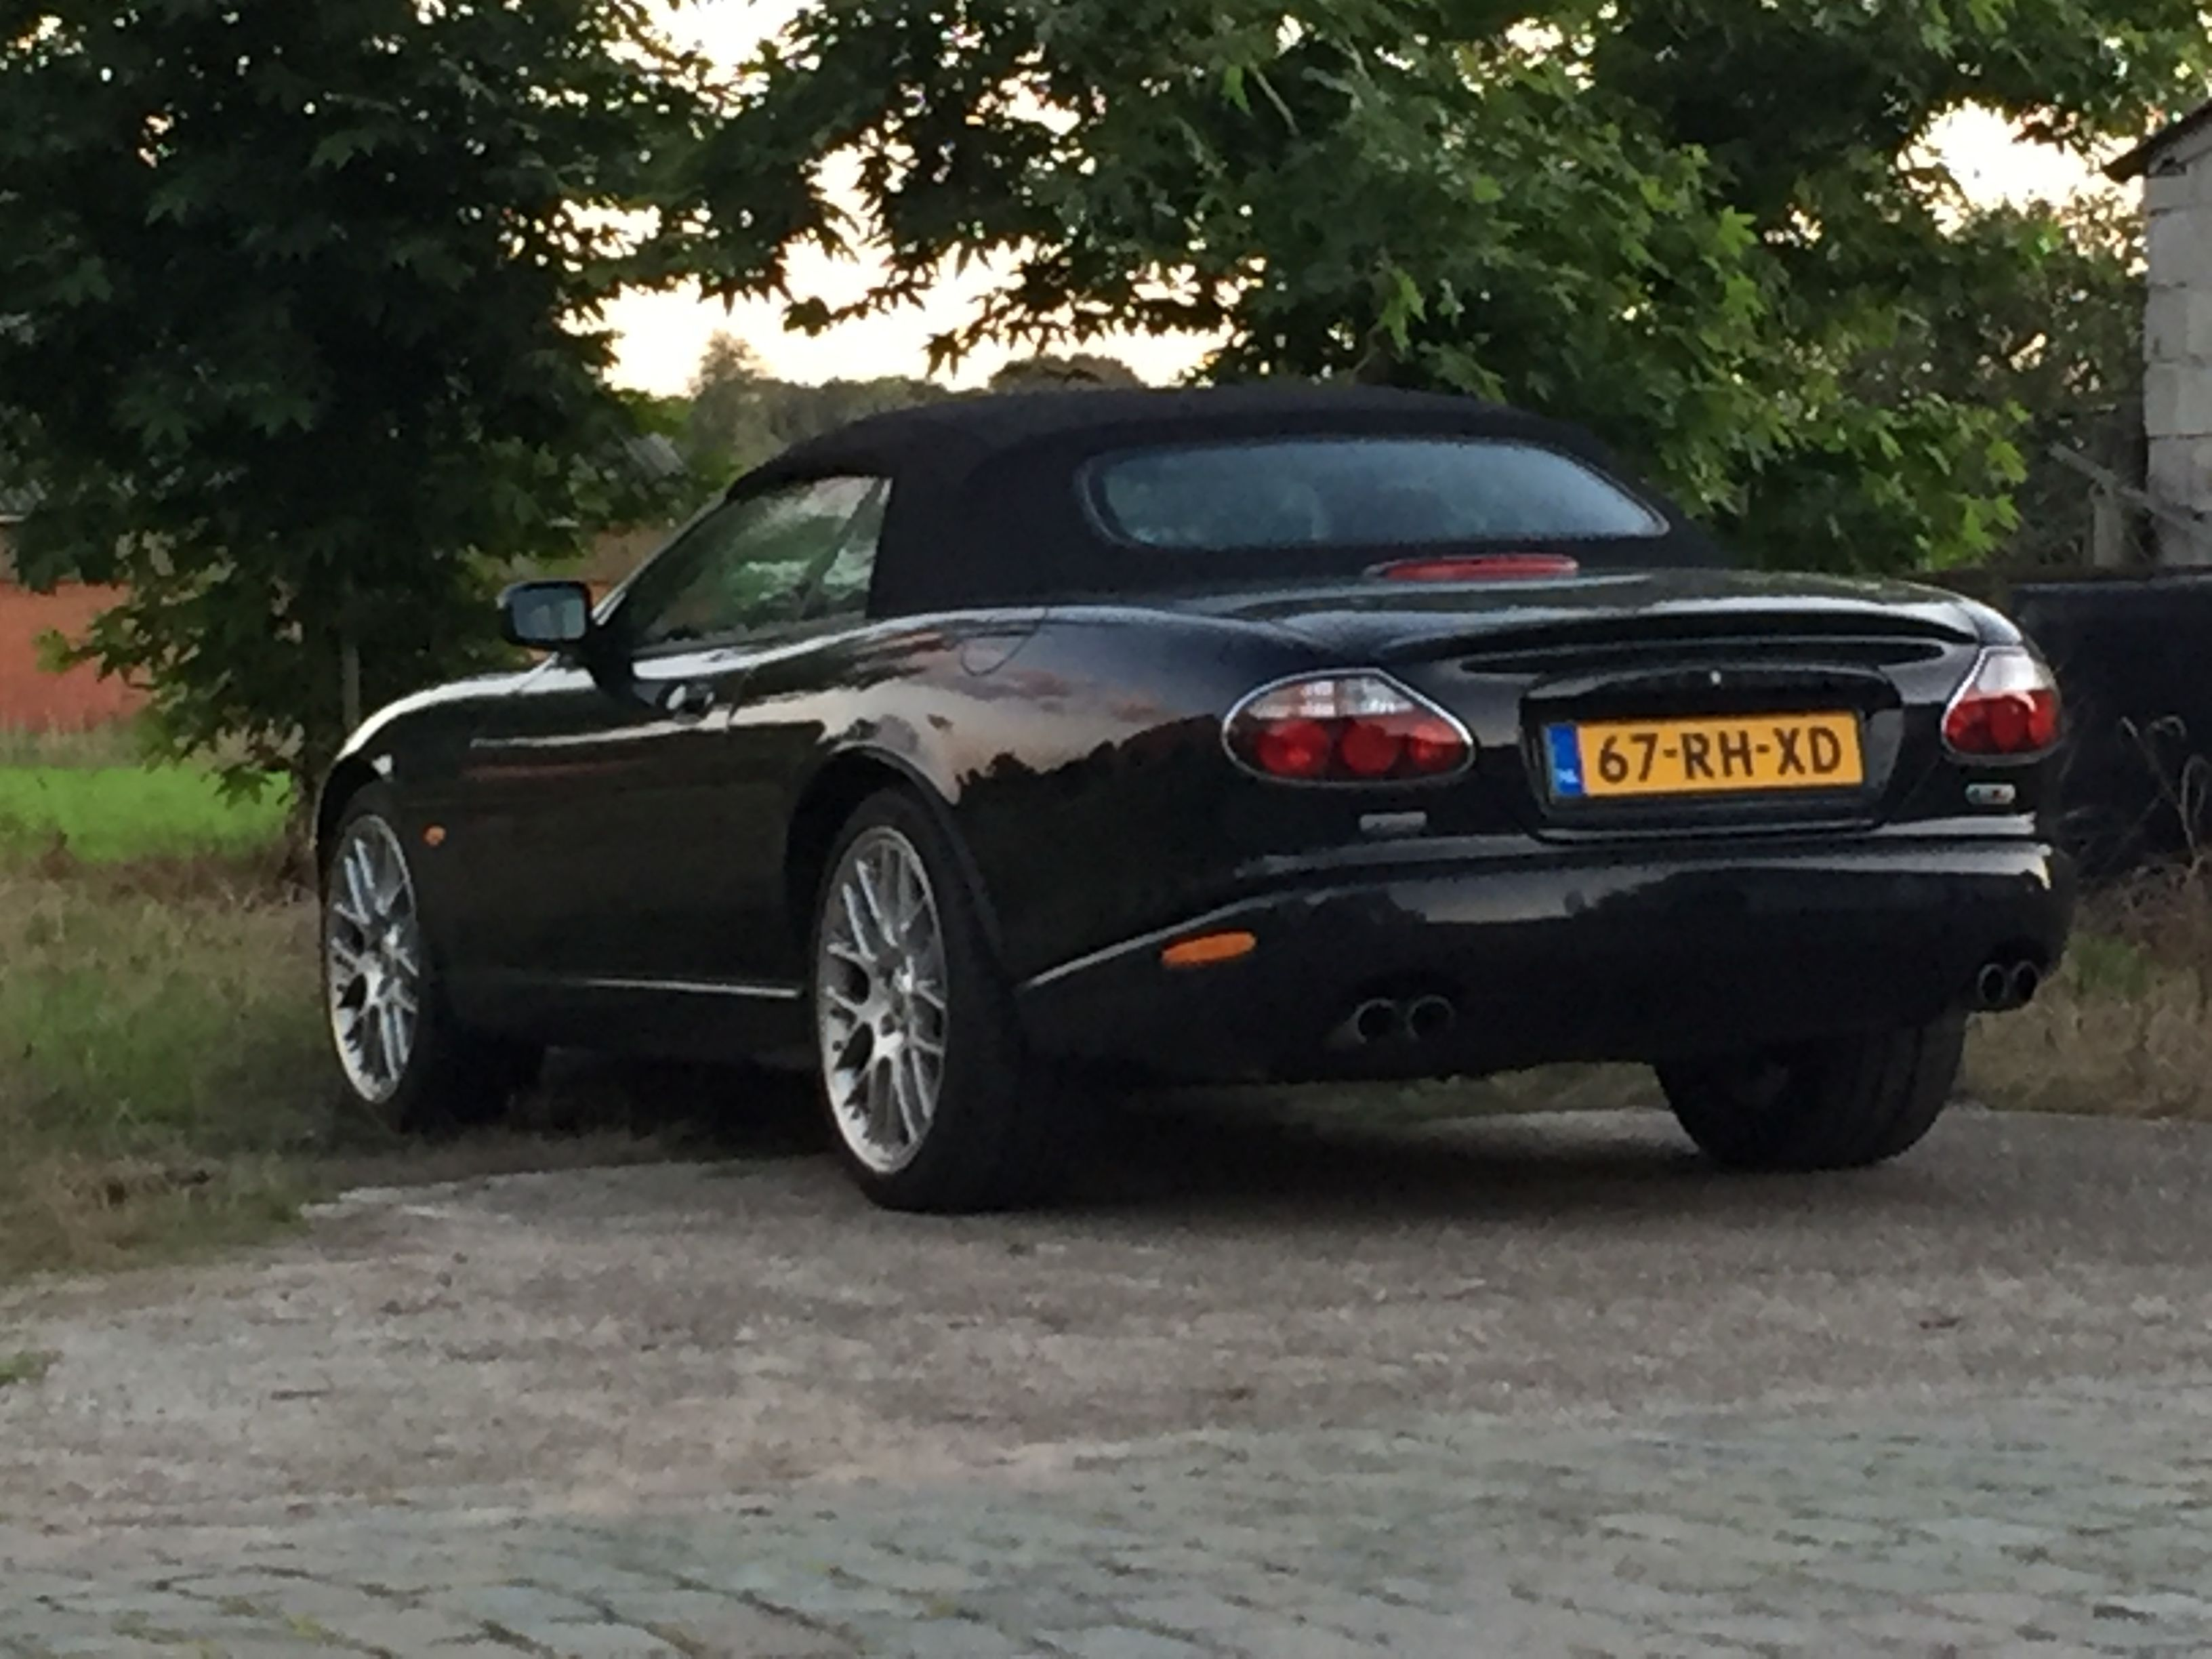 wiki file august d frontansicht cabriolet bcsseldorf jaguar